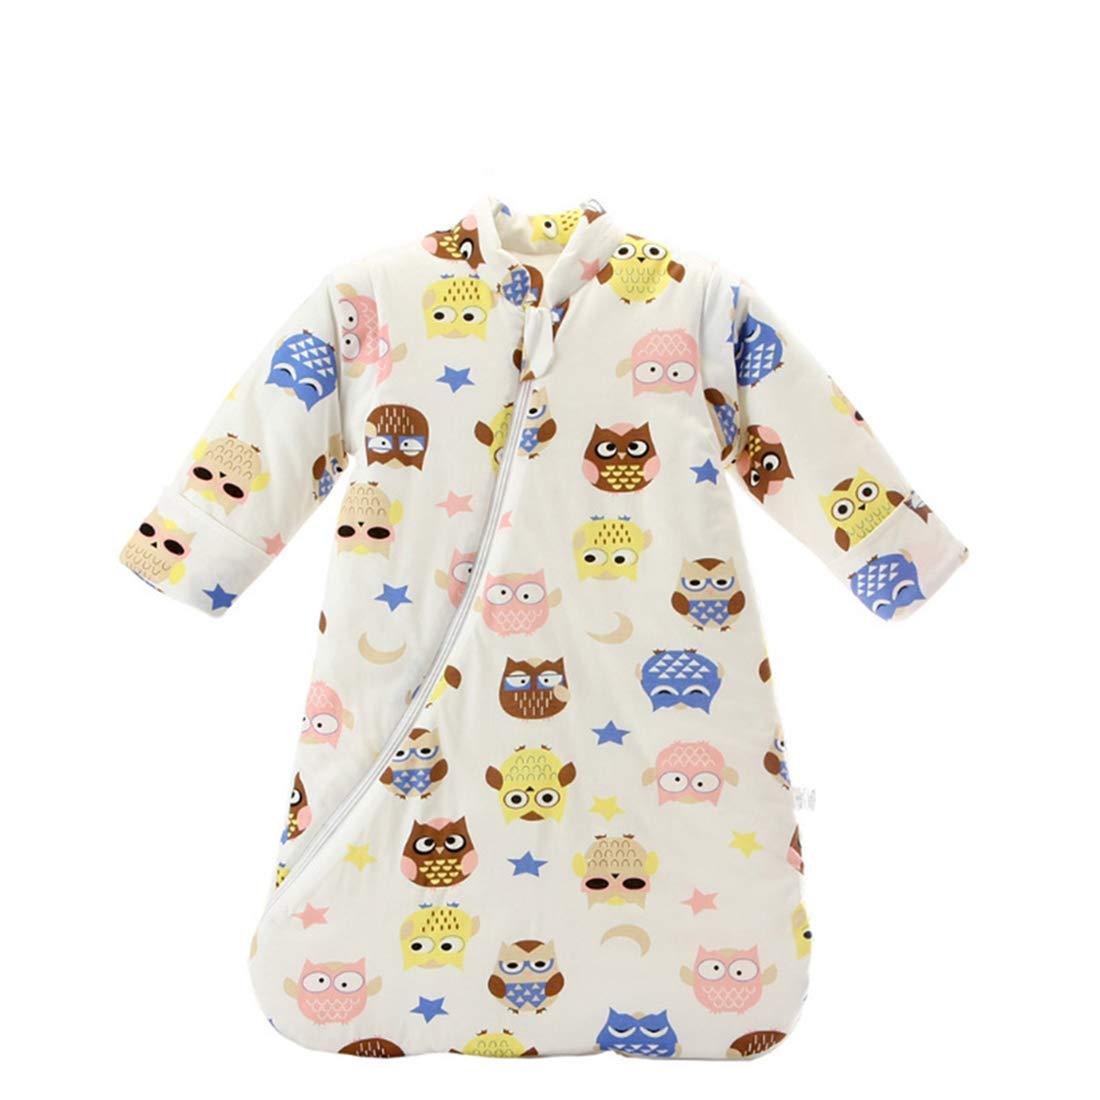 ALLAIBB Newborn Baby Warm Thick Sleepsack Cartoon Cotton Wearable Blanket Bunting Bag size S(0-5M) (Animal World)